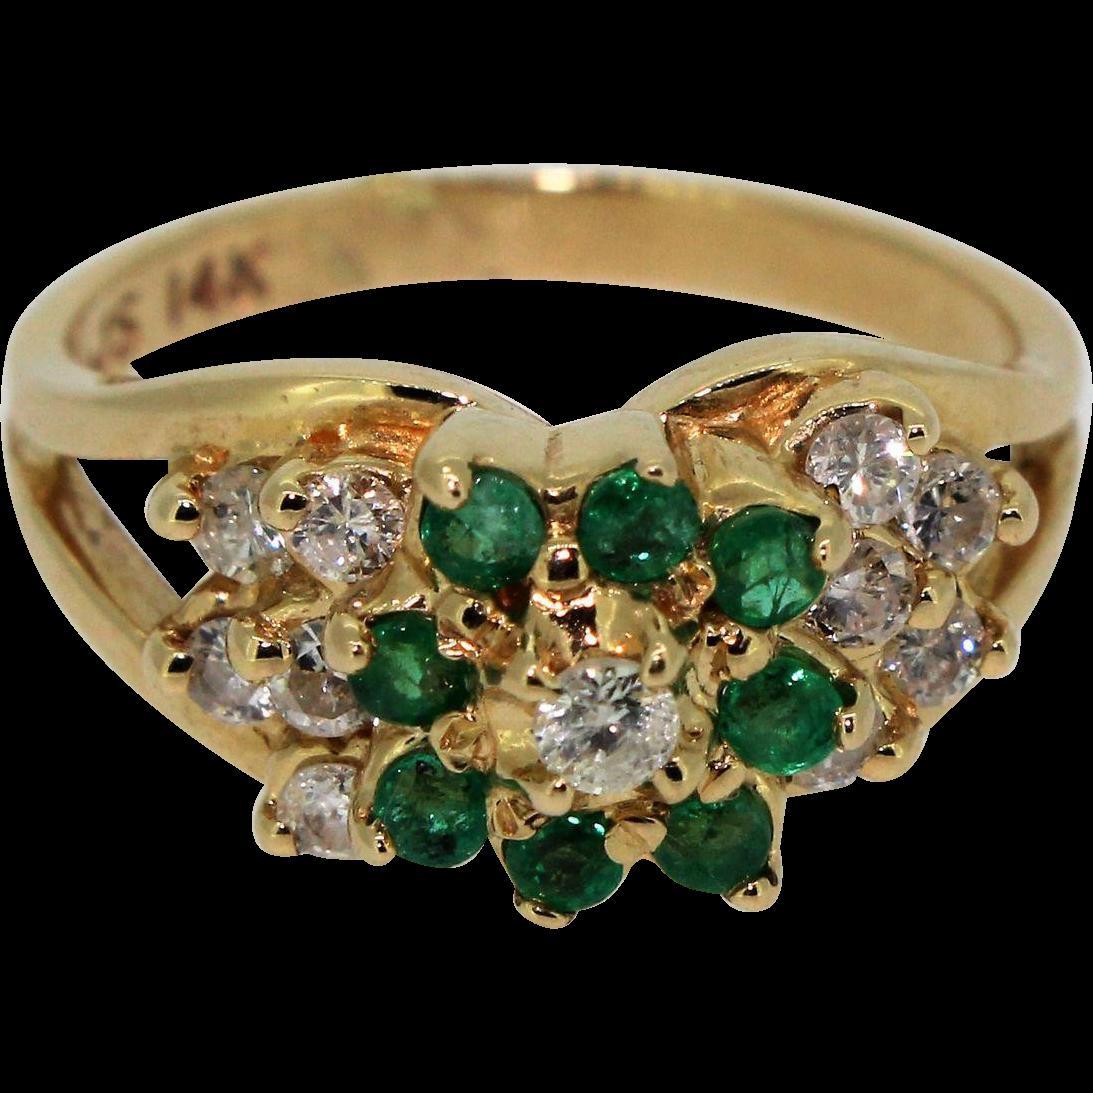 272c134b70 Vintage 14k Yellow Gold Emerald Flower & Diamond Cluster Ring in ...